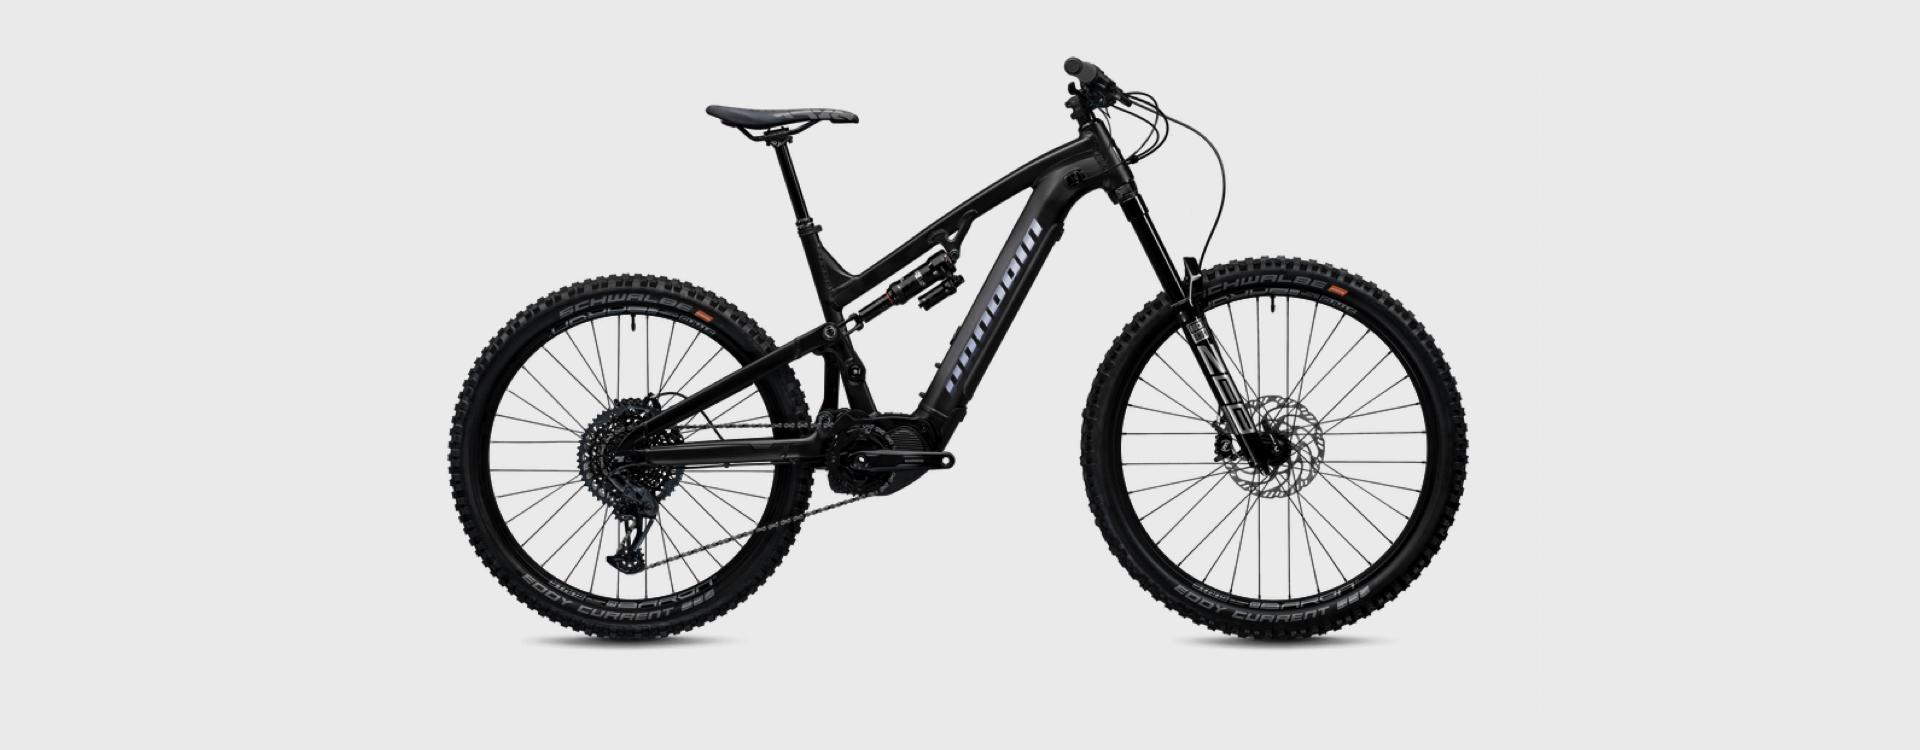 Bike Verleih Bad Salzdetfurth Propain Bikes Testcenter Niedersachsen Ekano 10 - AL - XL - Mix - Black - 1920x750